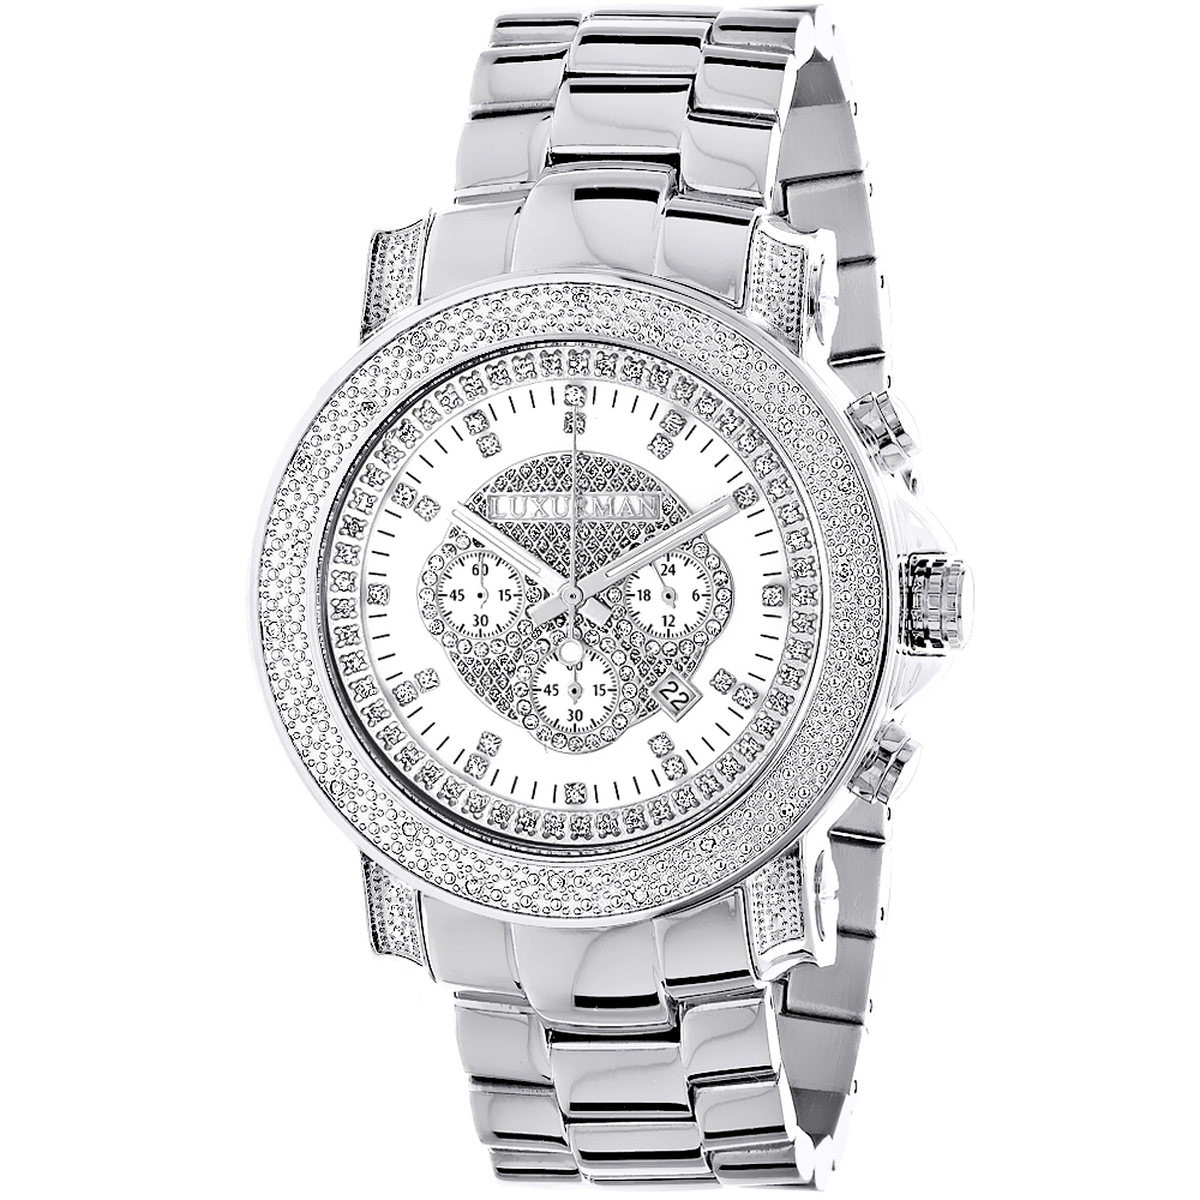 Mens Diamond Chronograph Watch by Luxurman 0.75ct Escalade